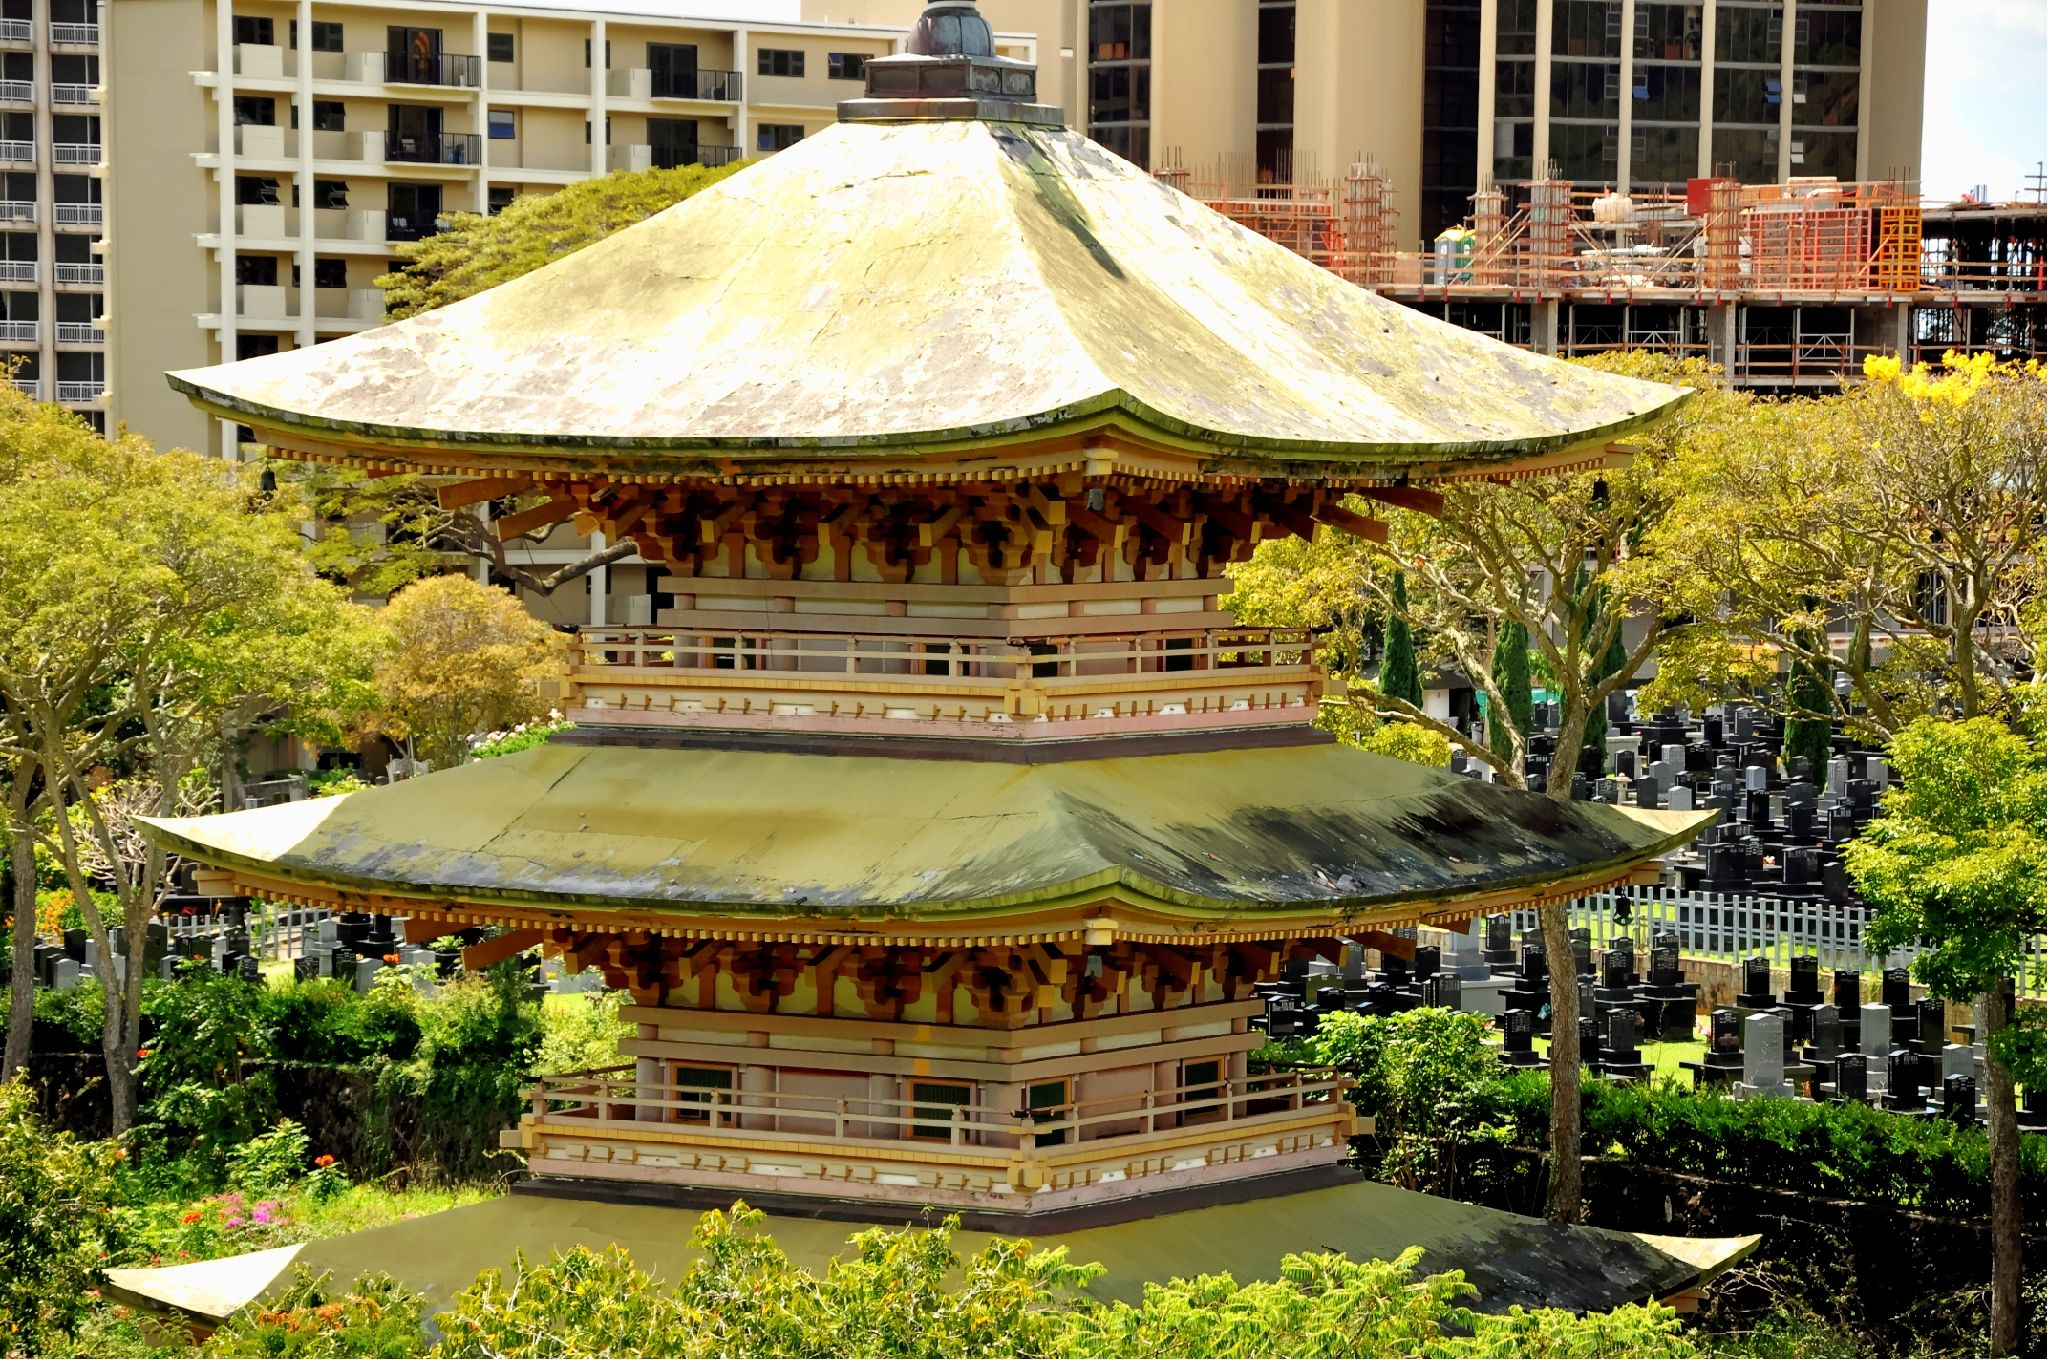 Kyoto Garden, Honolulu